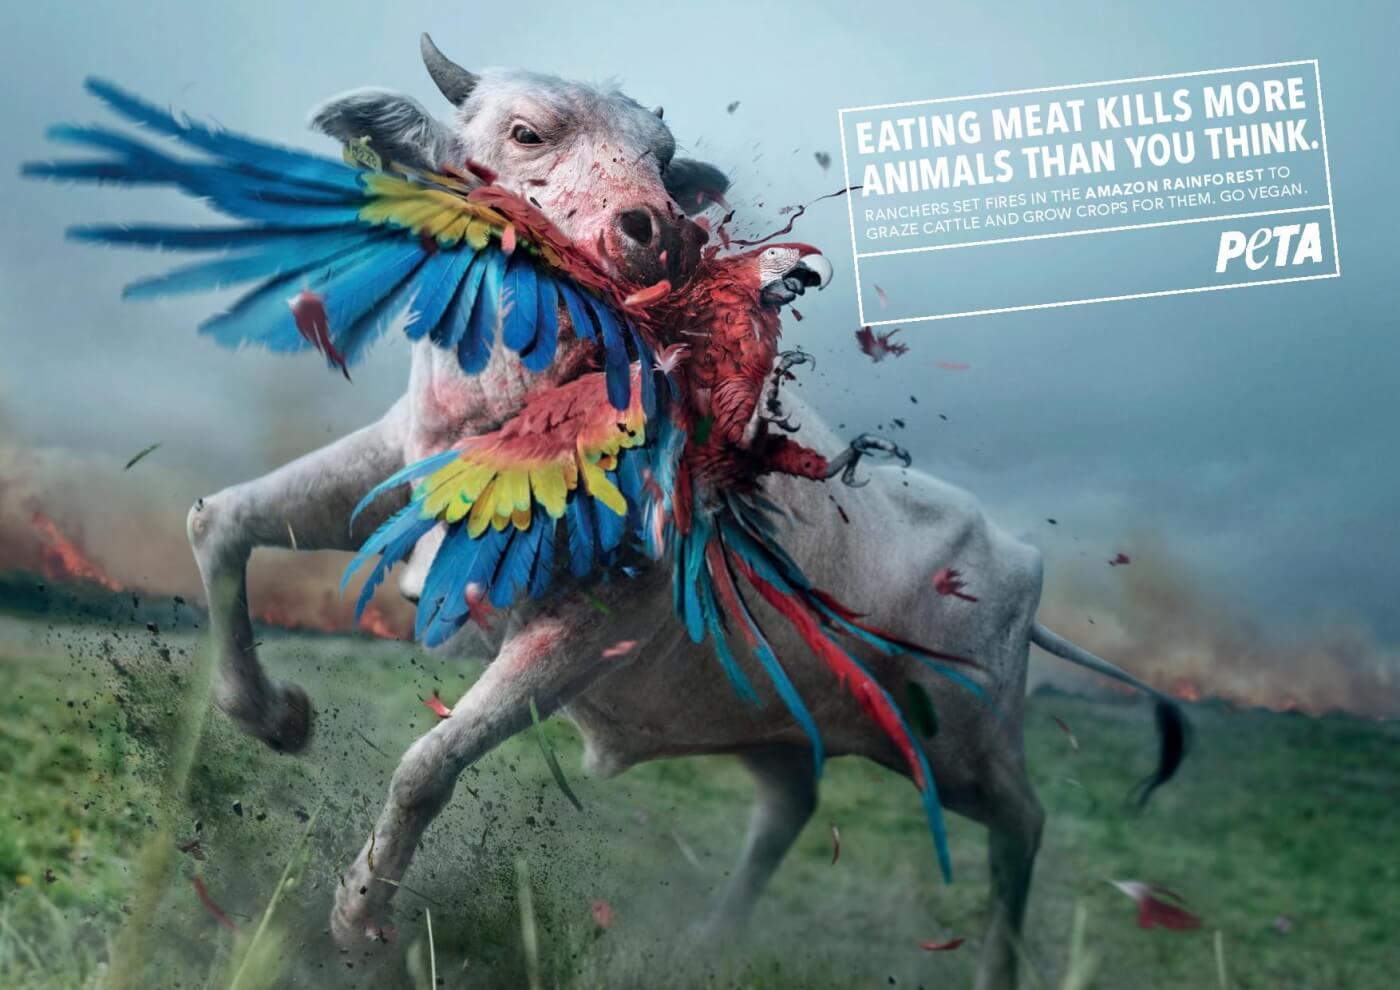 Eating Meat Kills The Amazon